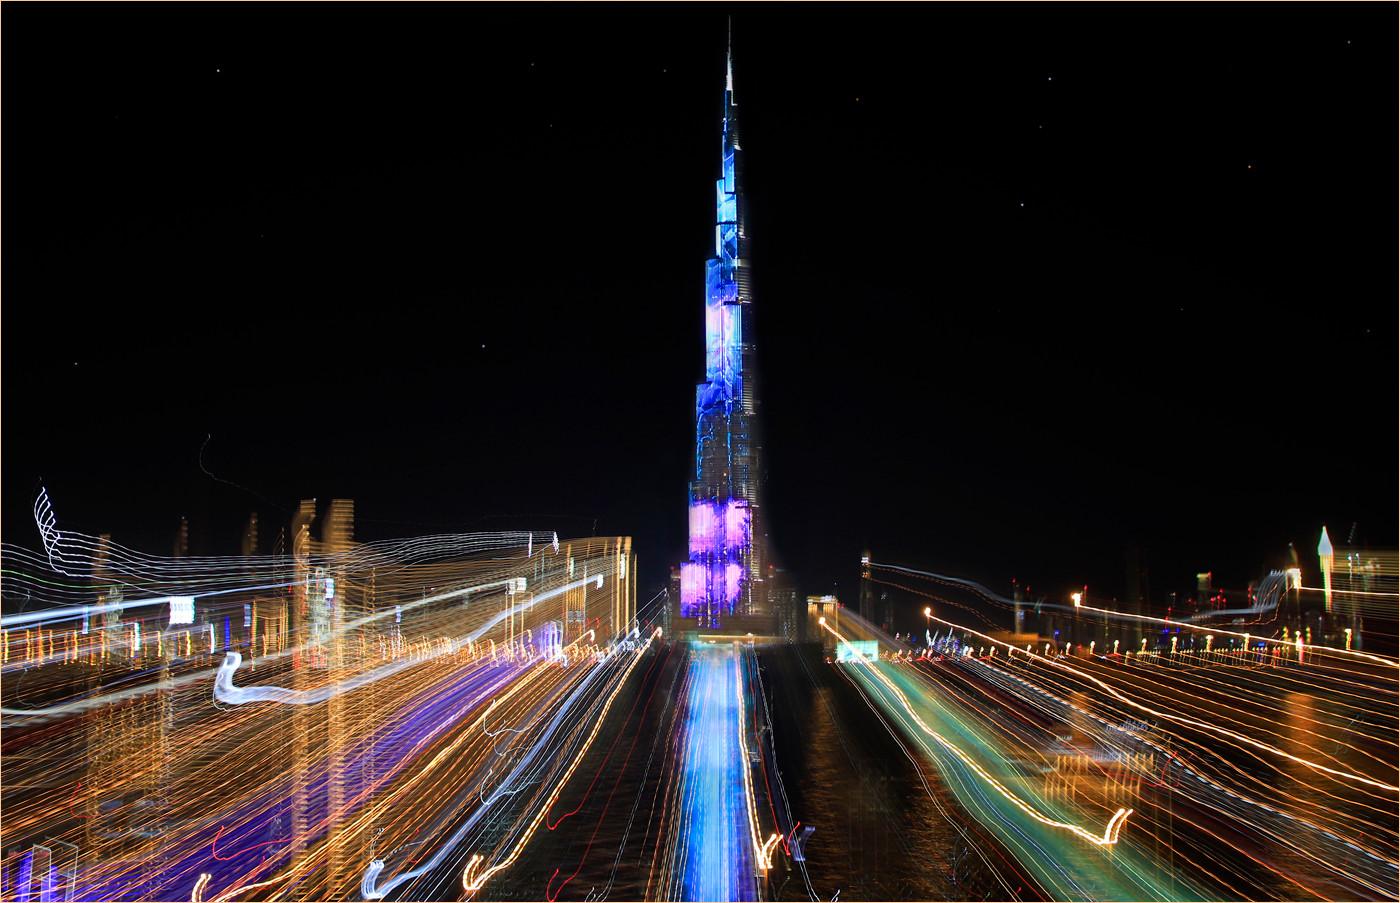 17 BURJ KHALIFA DUBAI by Dave Brooker